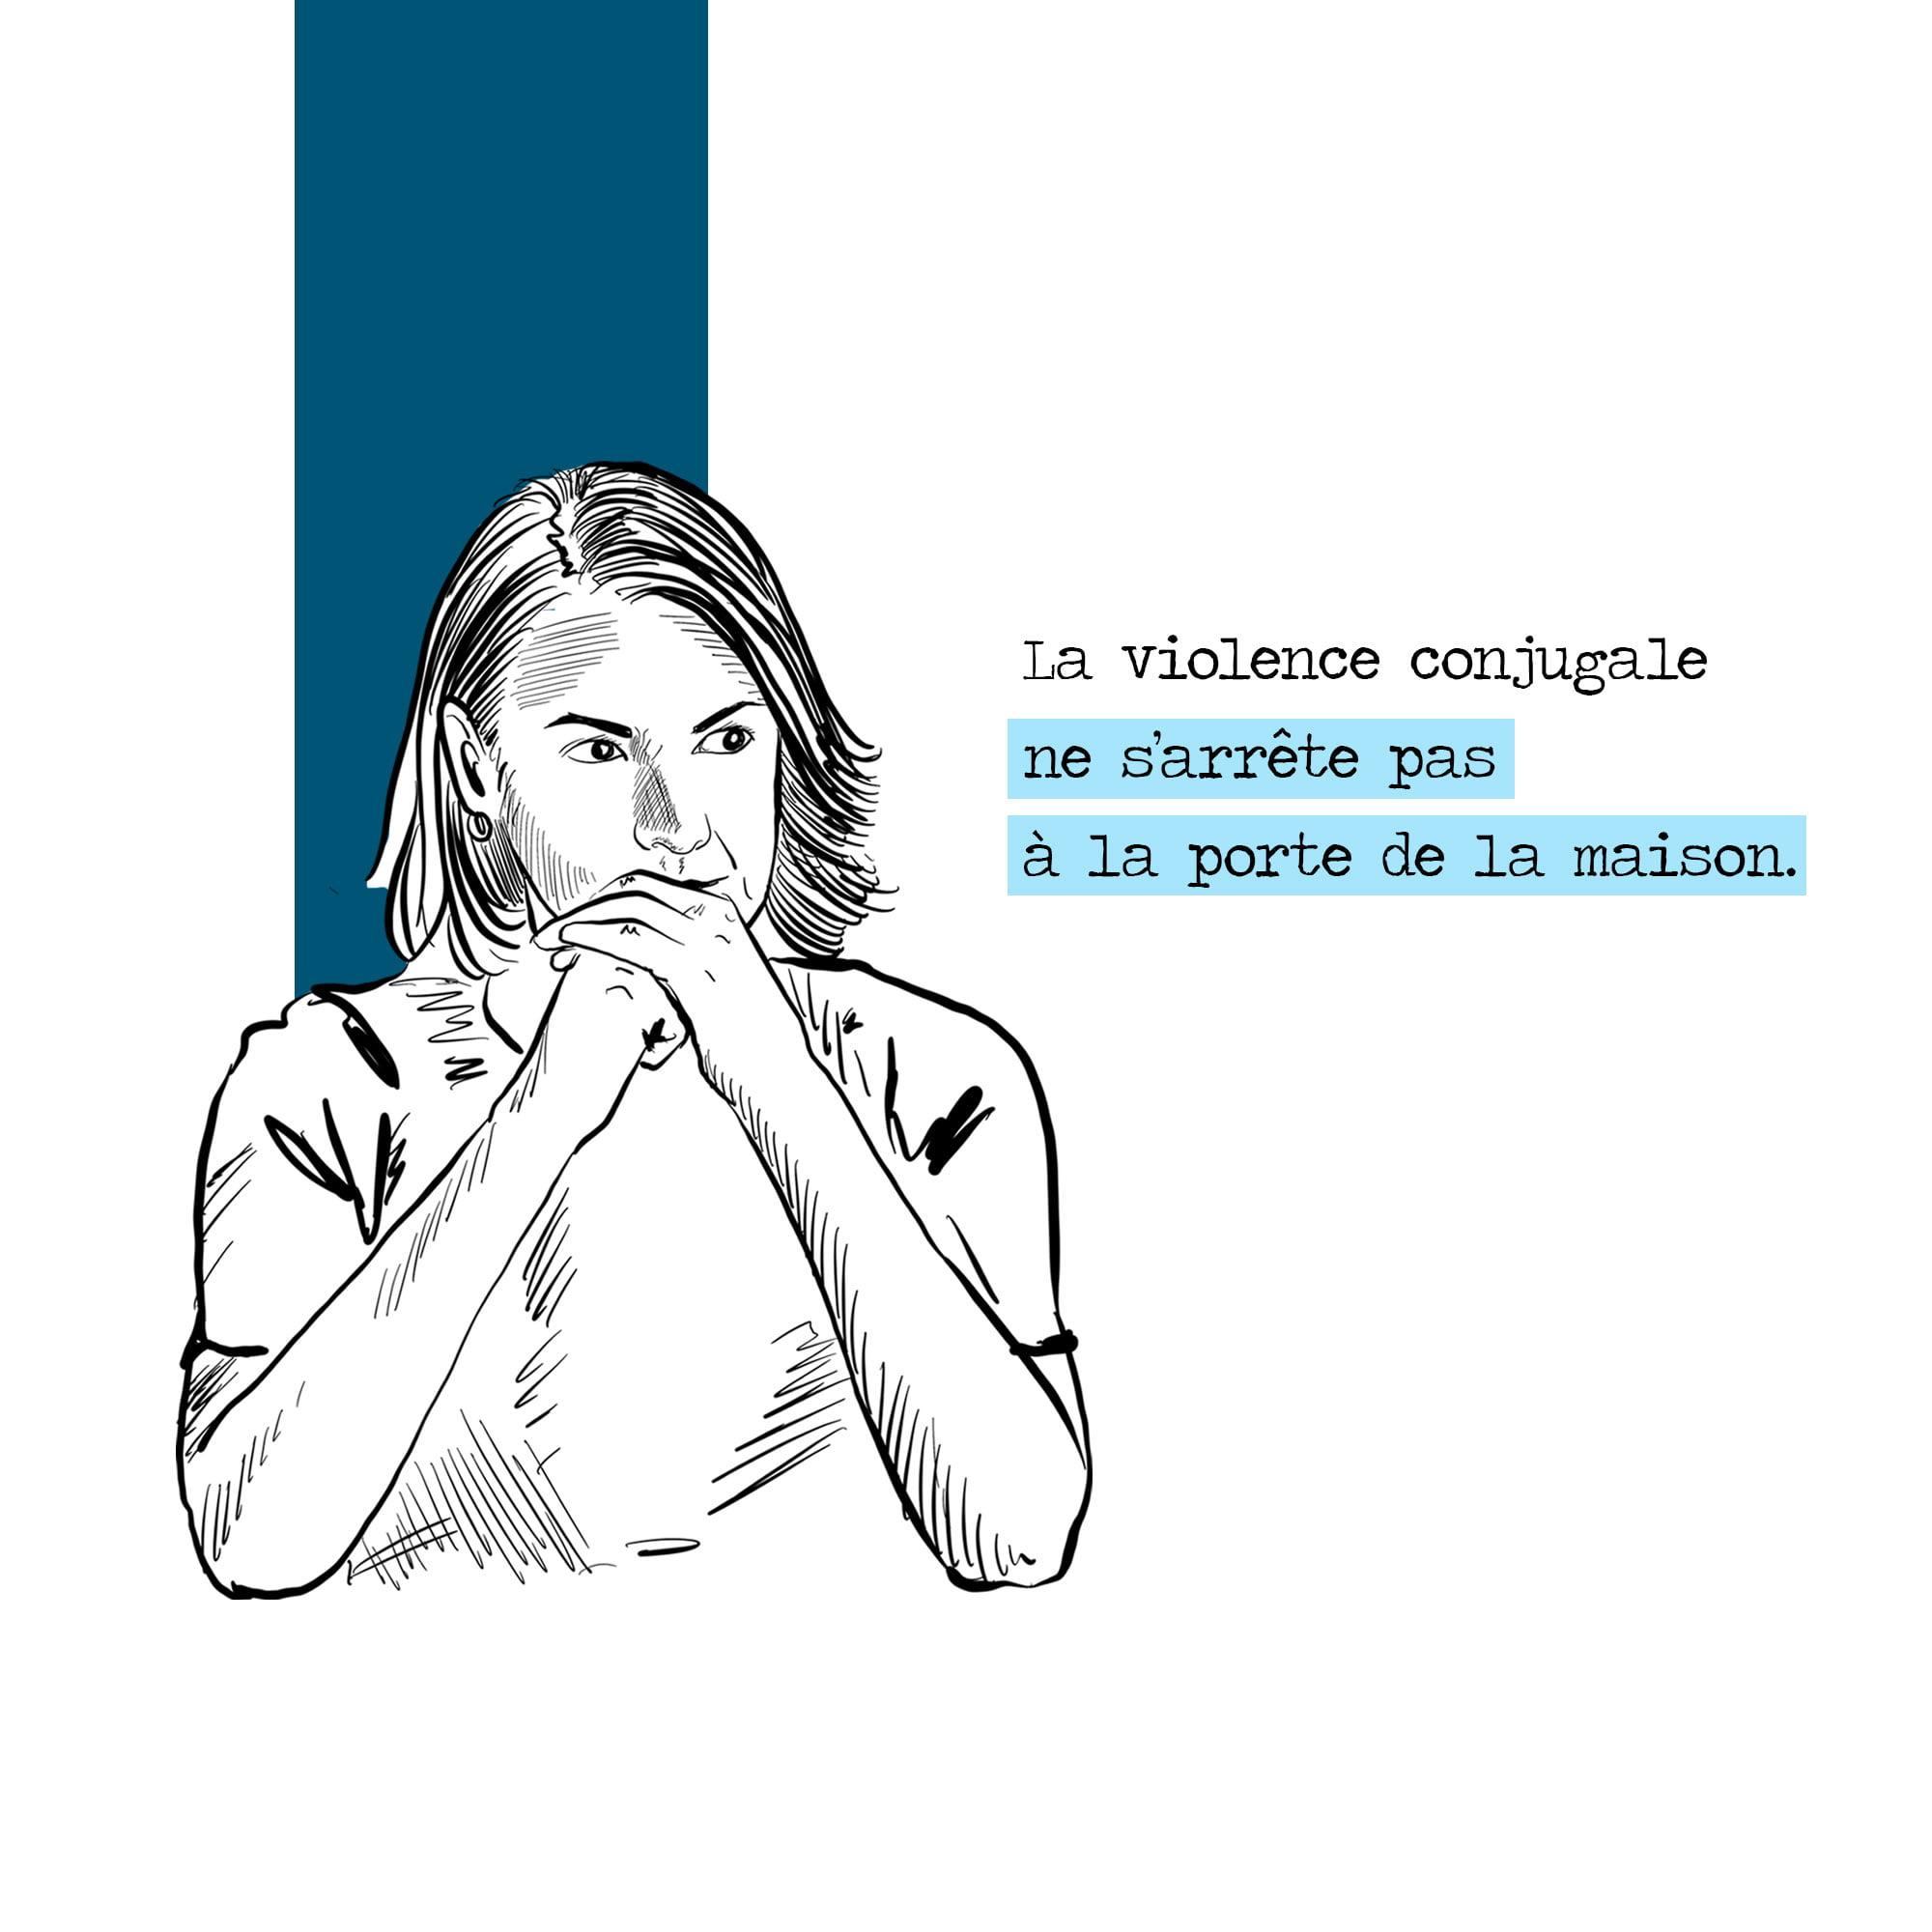 Campagne contre violences conjugales